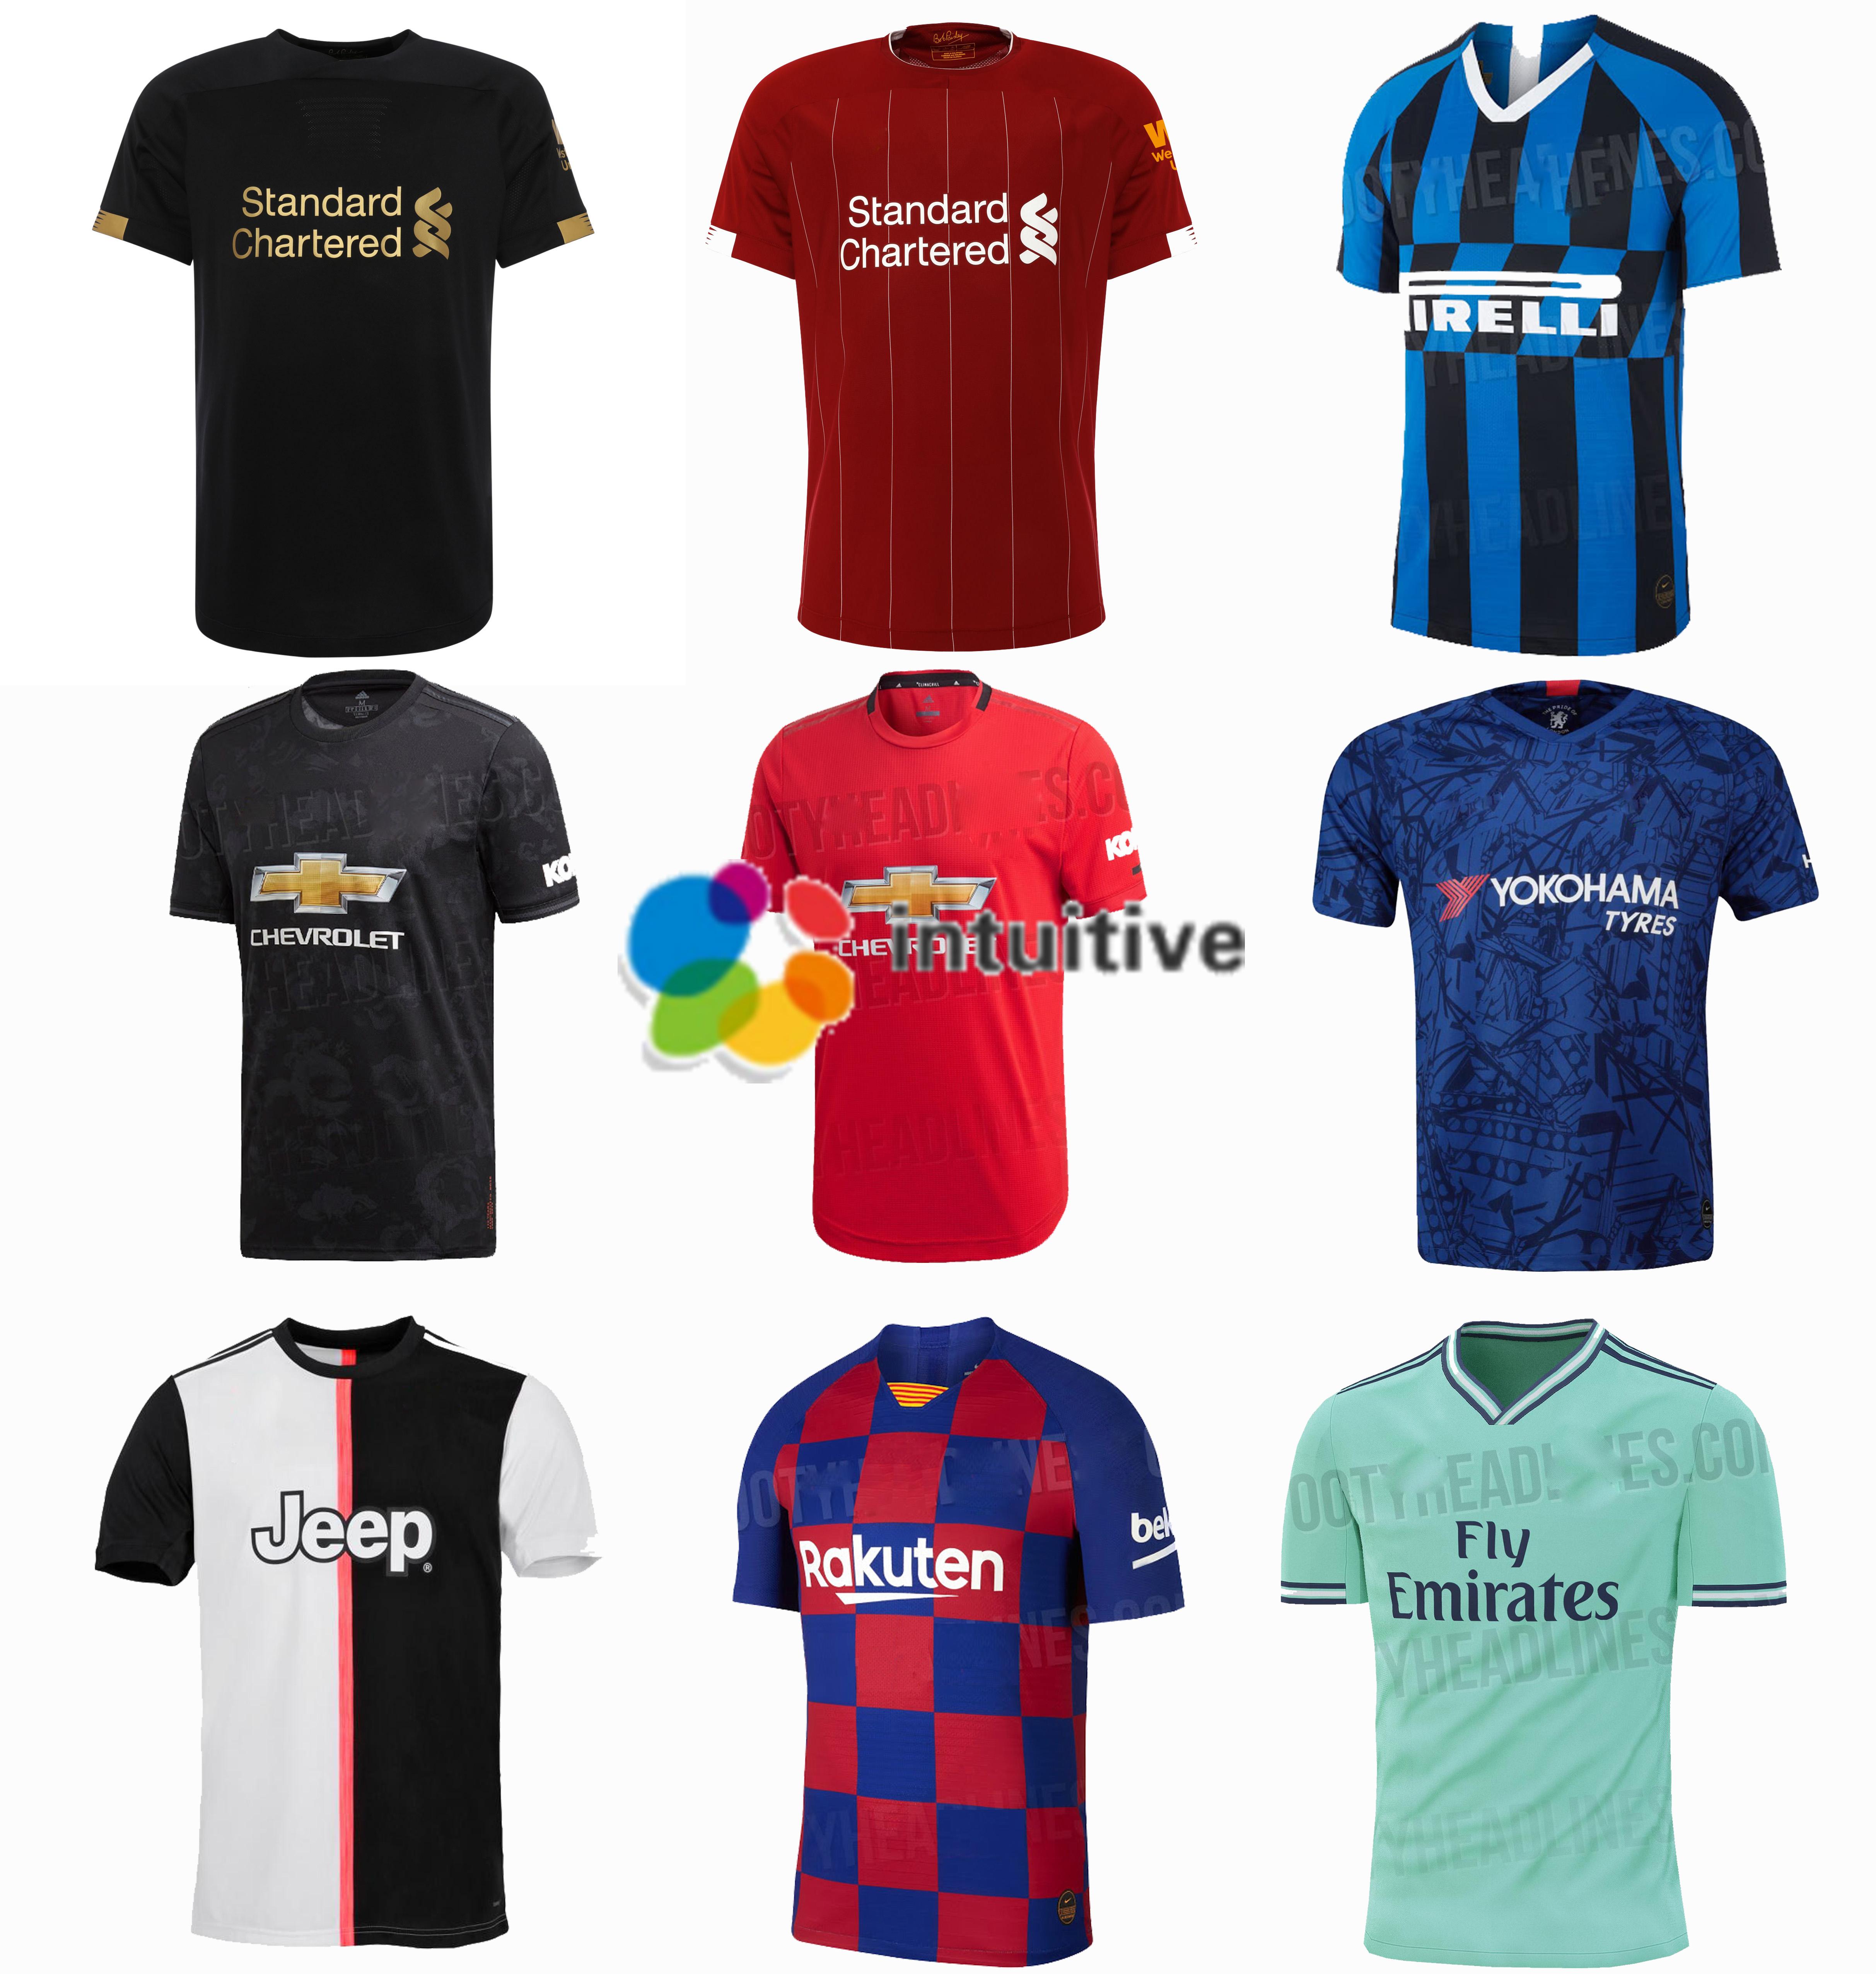 19/20 top thai man madrid city juventus tottenham everton soccer football jersey shirts kit фото